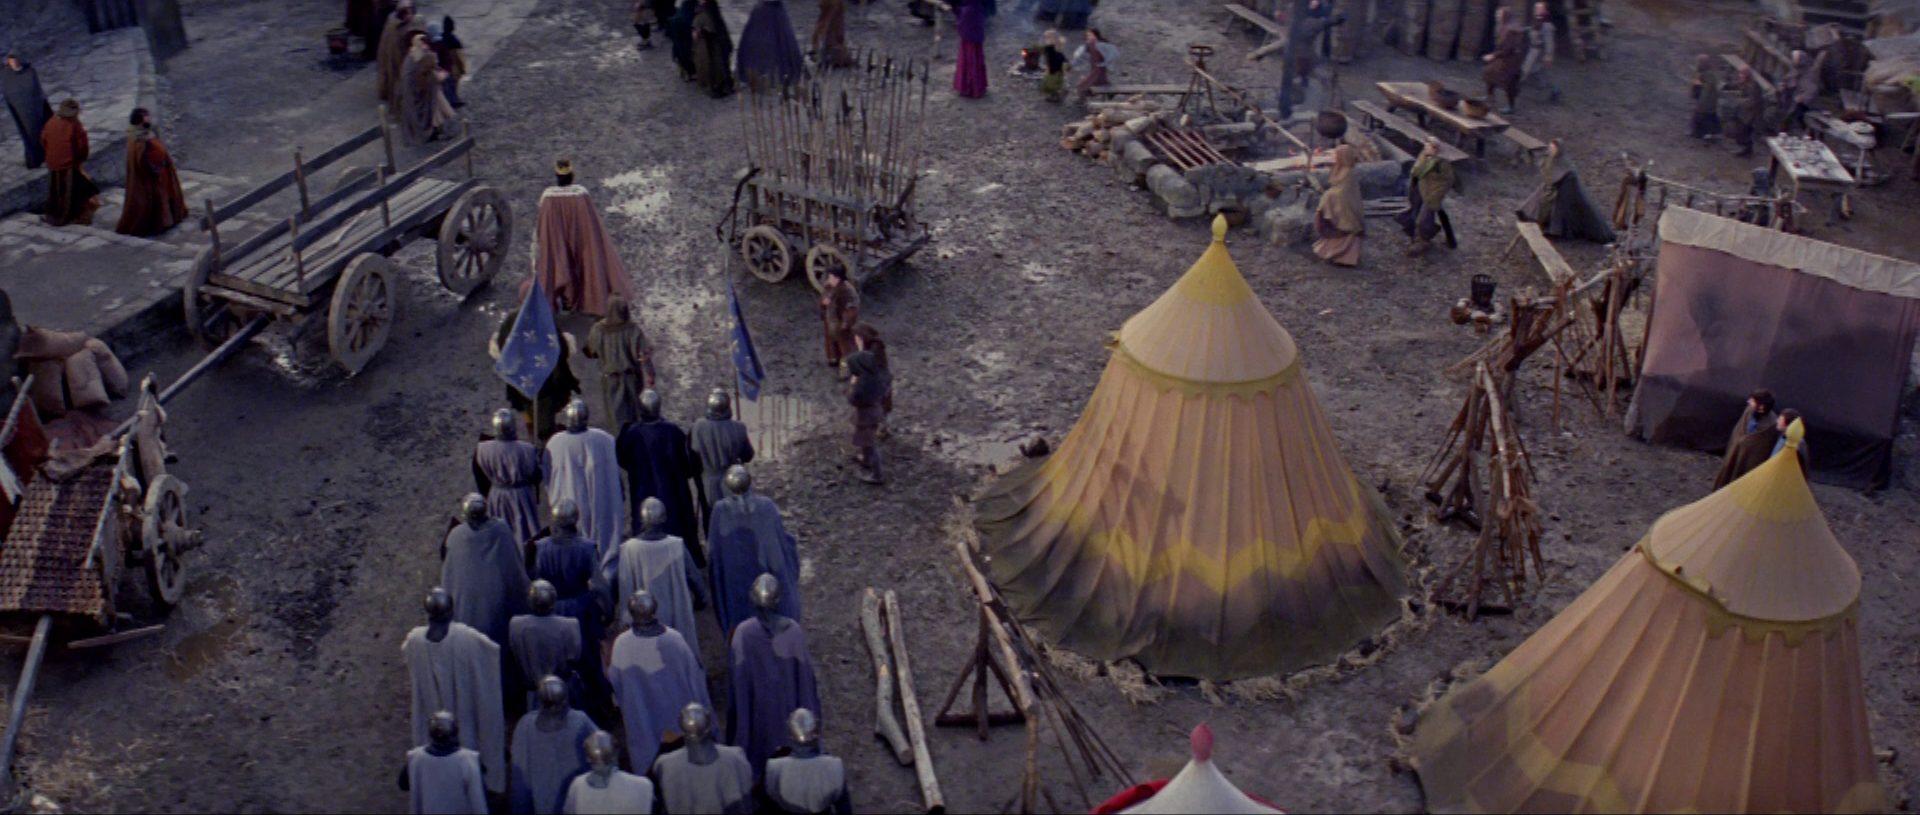 Szene aus 'Der Löwe im Winter(1968)', Copyright: Haworth Productions, Conbow Productions, Studiocanal